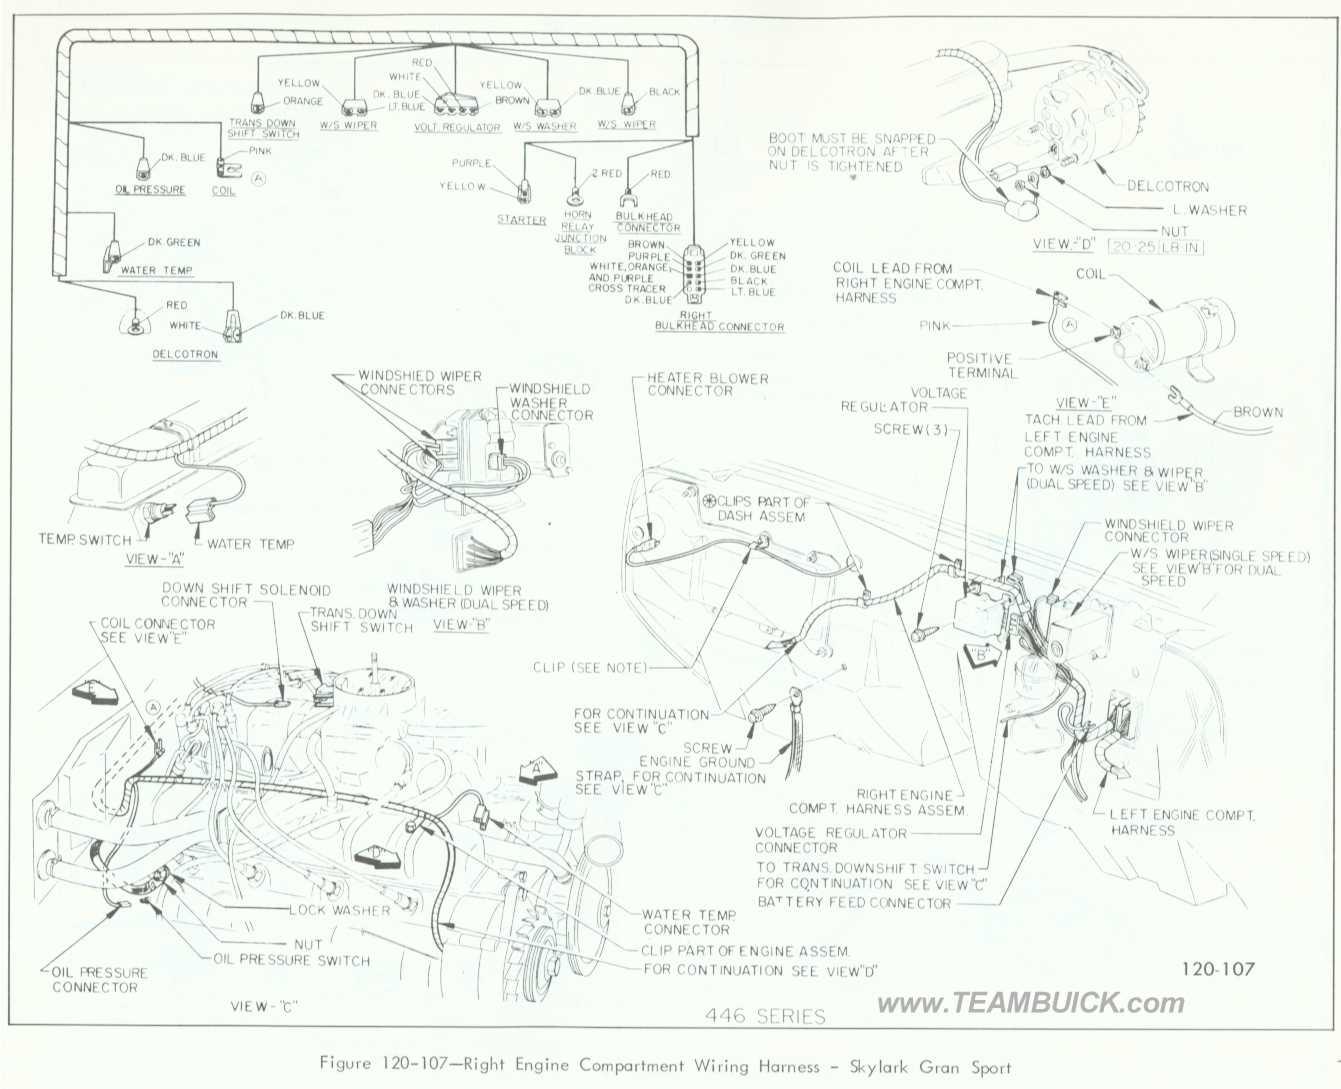 hight resolution of 1966 buick skylark gran sport right engine compartment wiring harness rh teambuick com 1964 buick skylark 1969 buick skylark